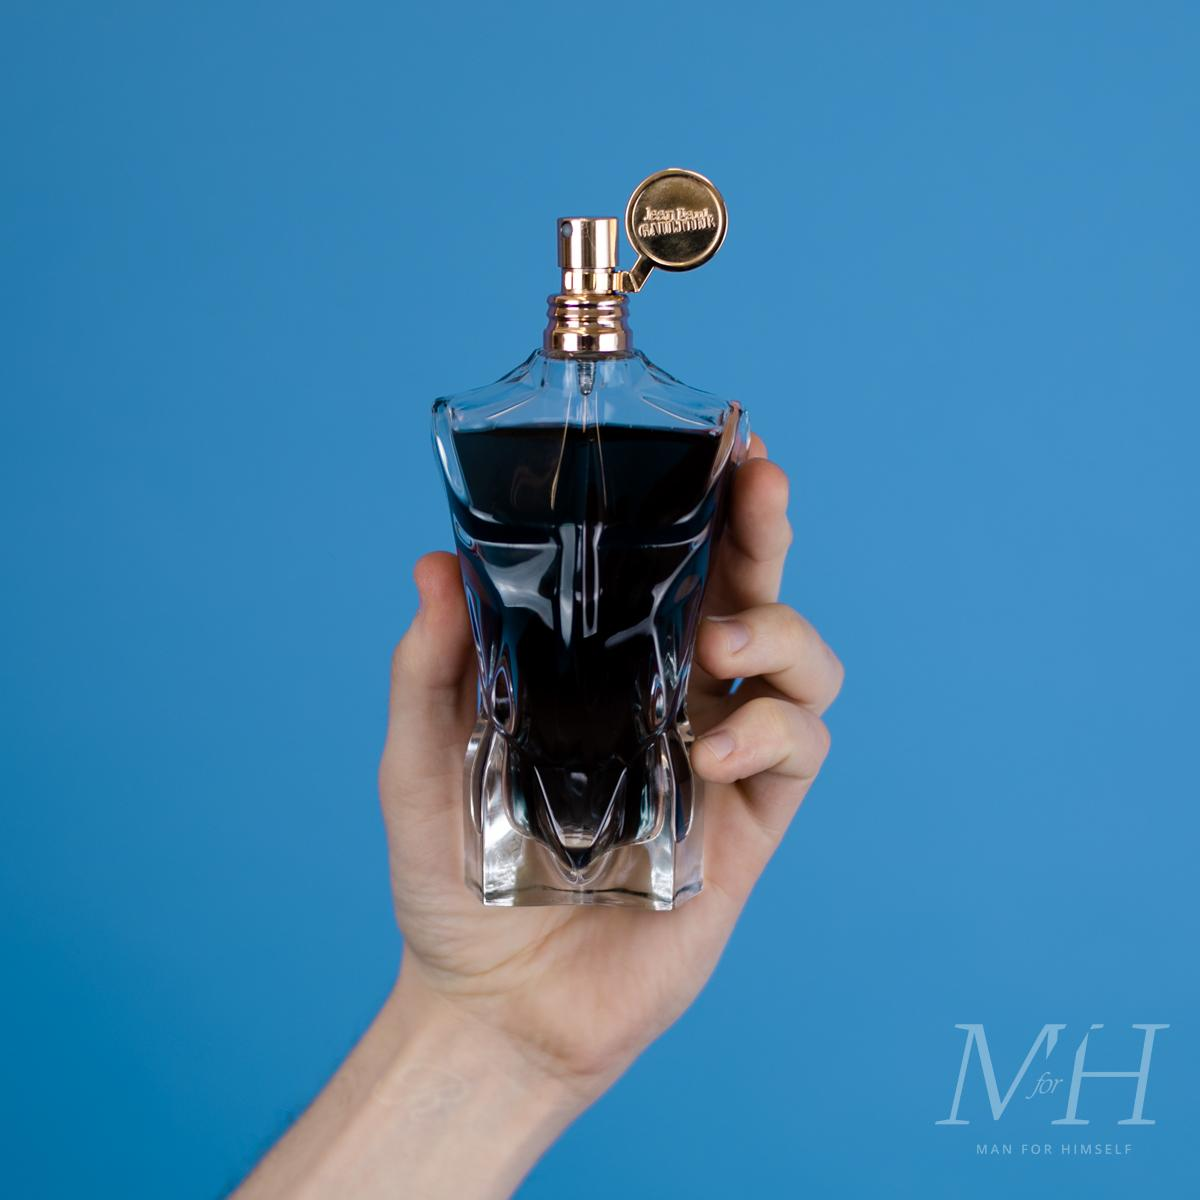 jean-paul-gaultier-le-male-essence-review-man-for-himself